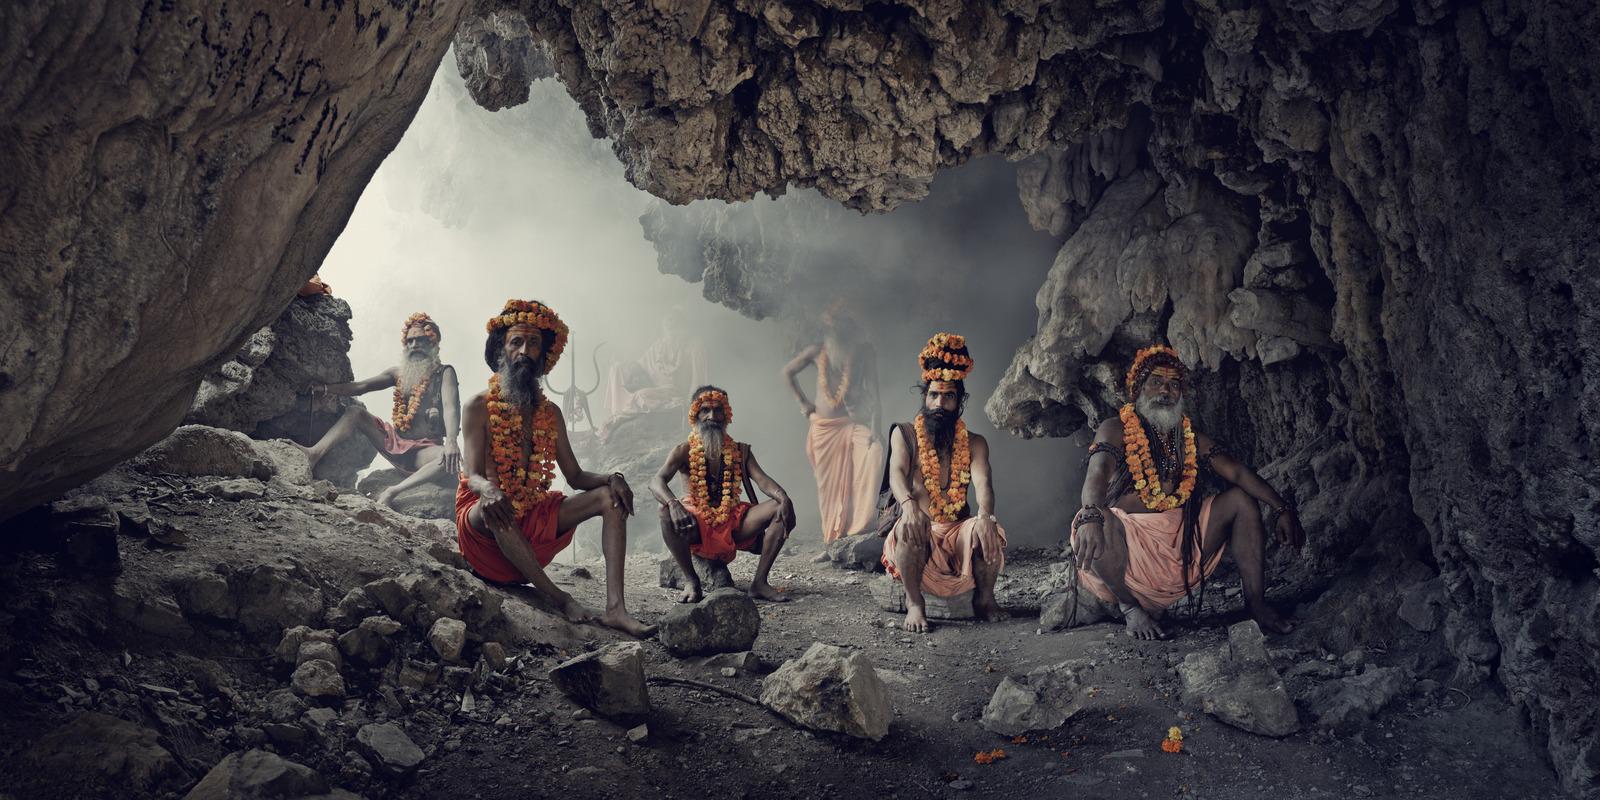 Jimmy Nelson - XXIV 1   Cave, Sadhus,  Haridwar, India, 2016